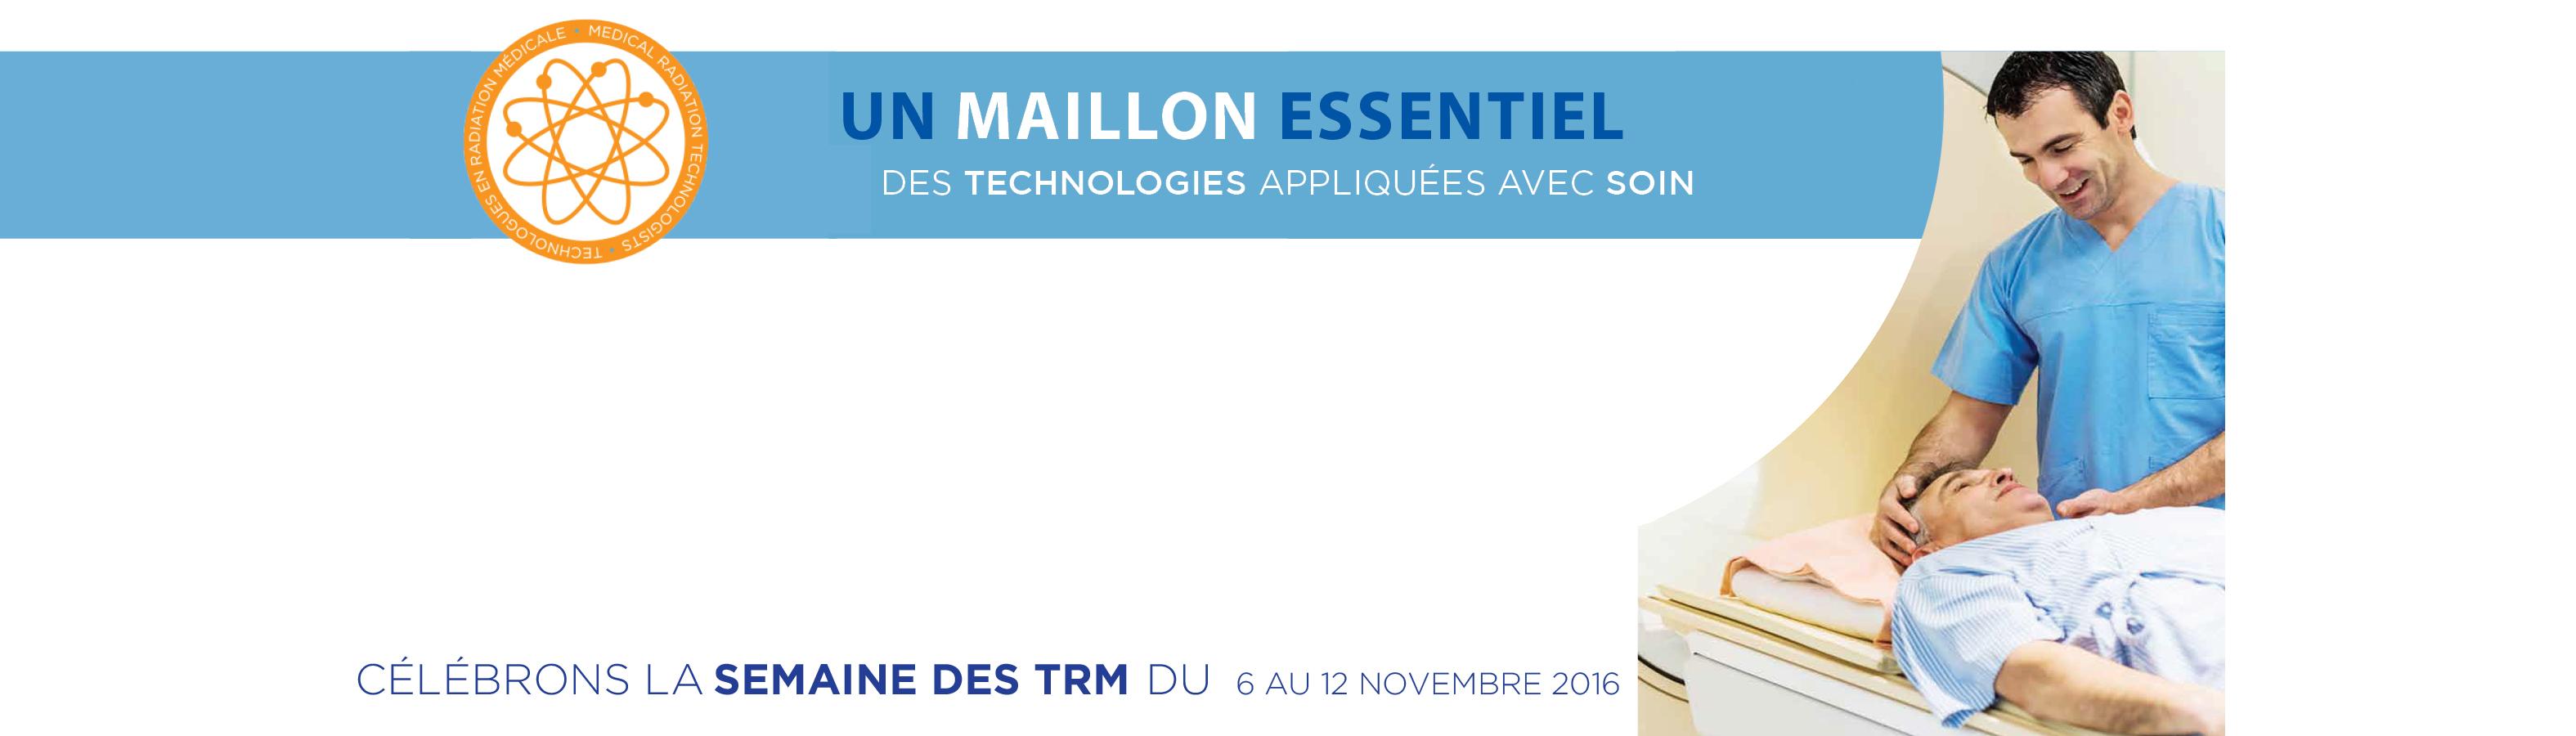 MRT-Week-Banner-French4